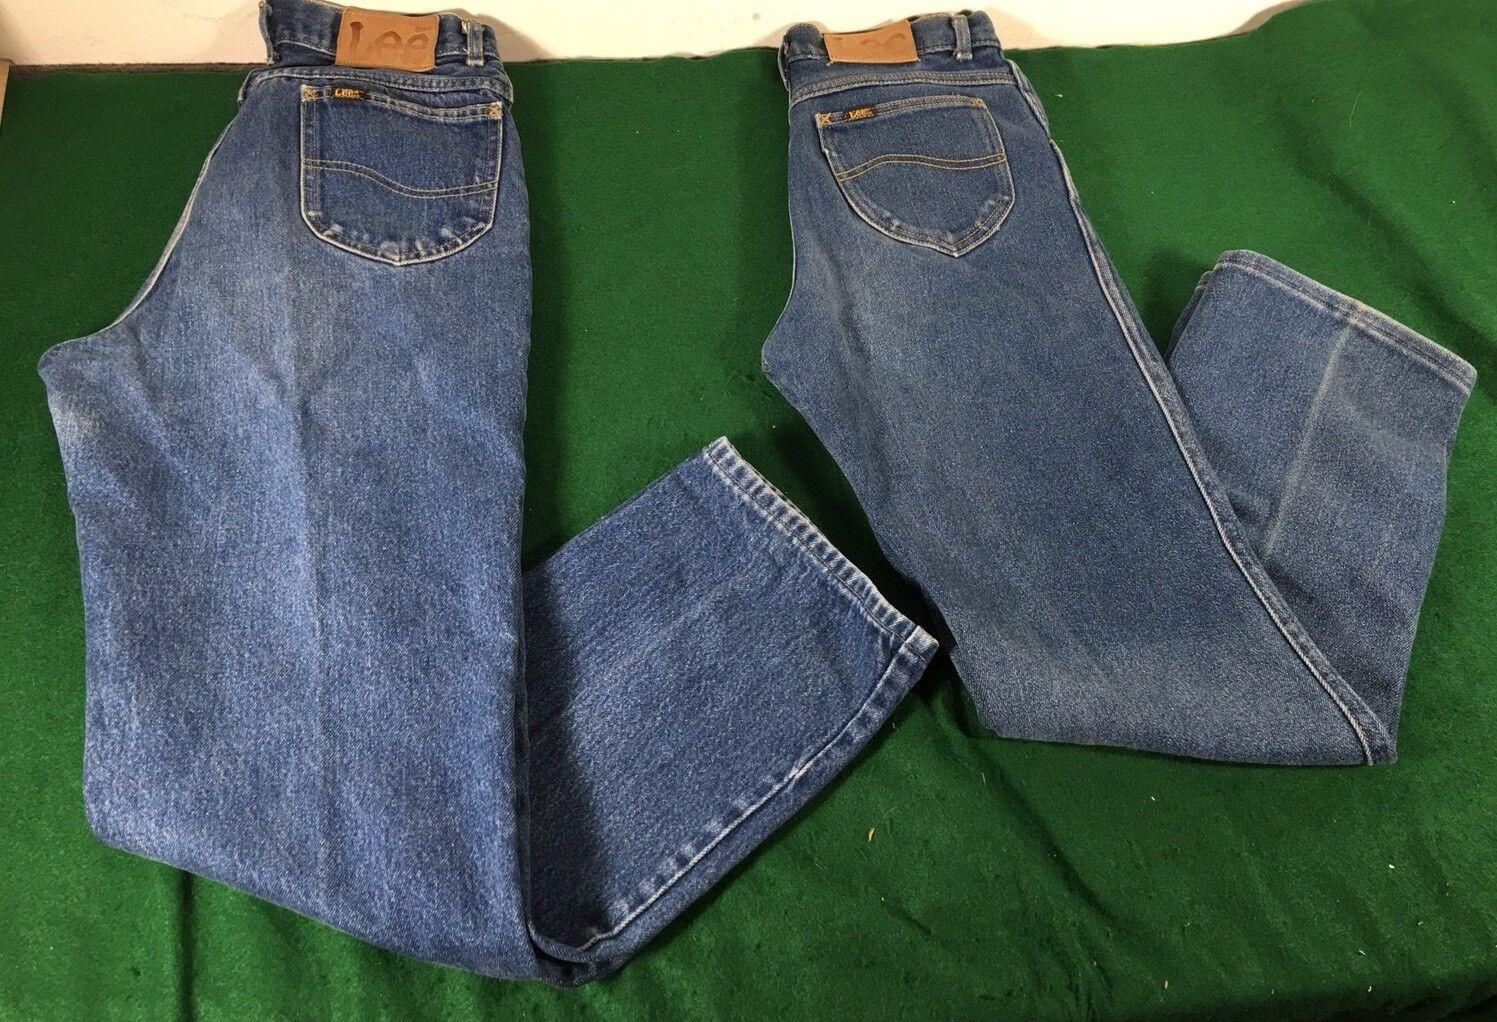 Vtg 1970's Lee Rider Denim Jeans Talon Zipper Made In USA 28x29 Men's 2 pairs